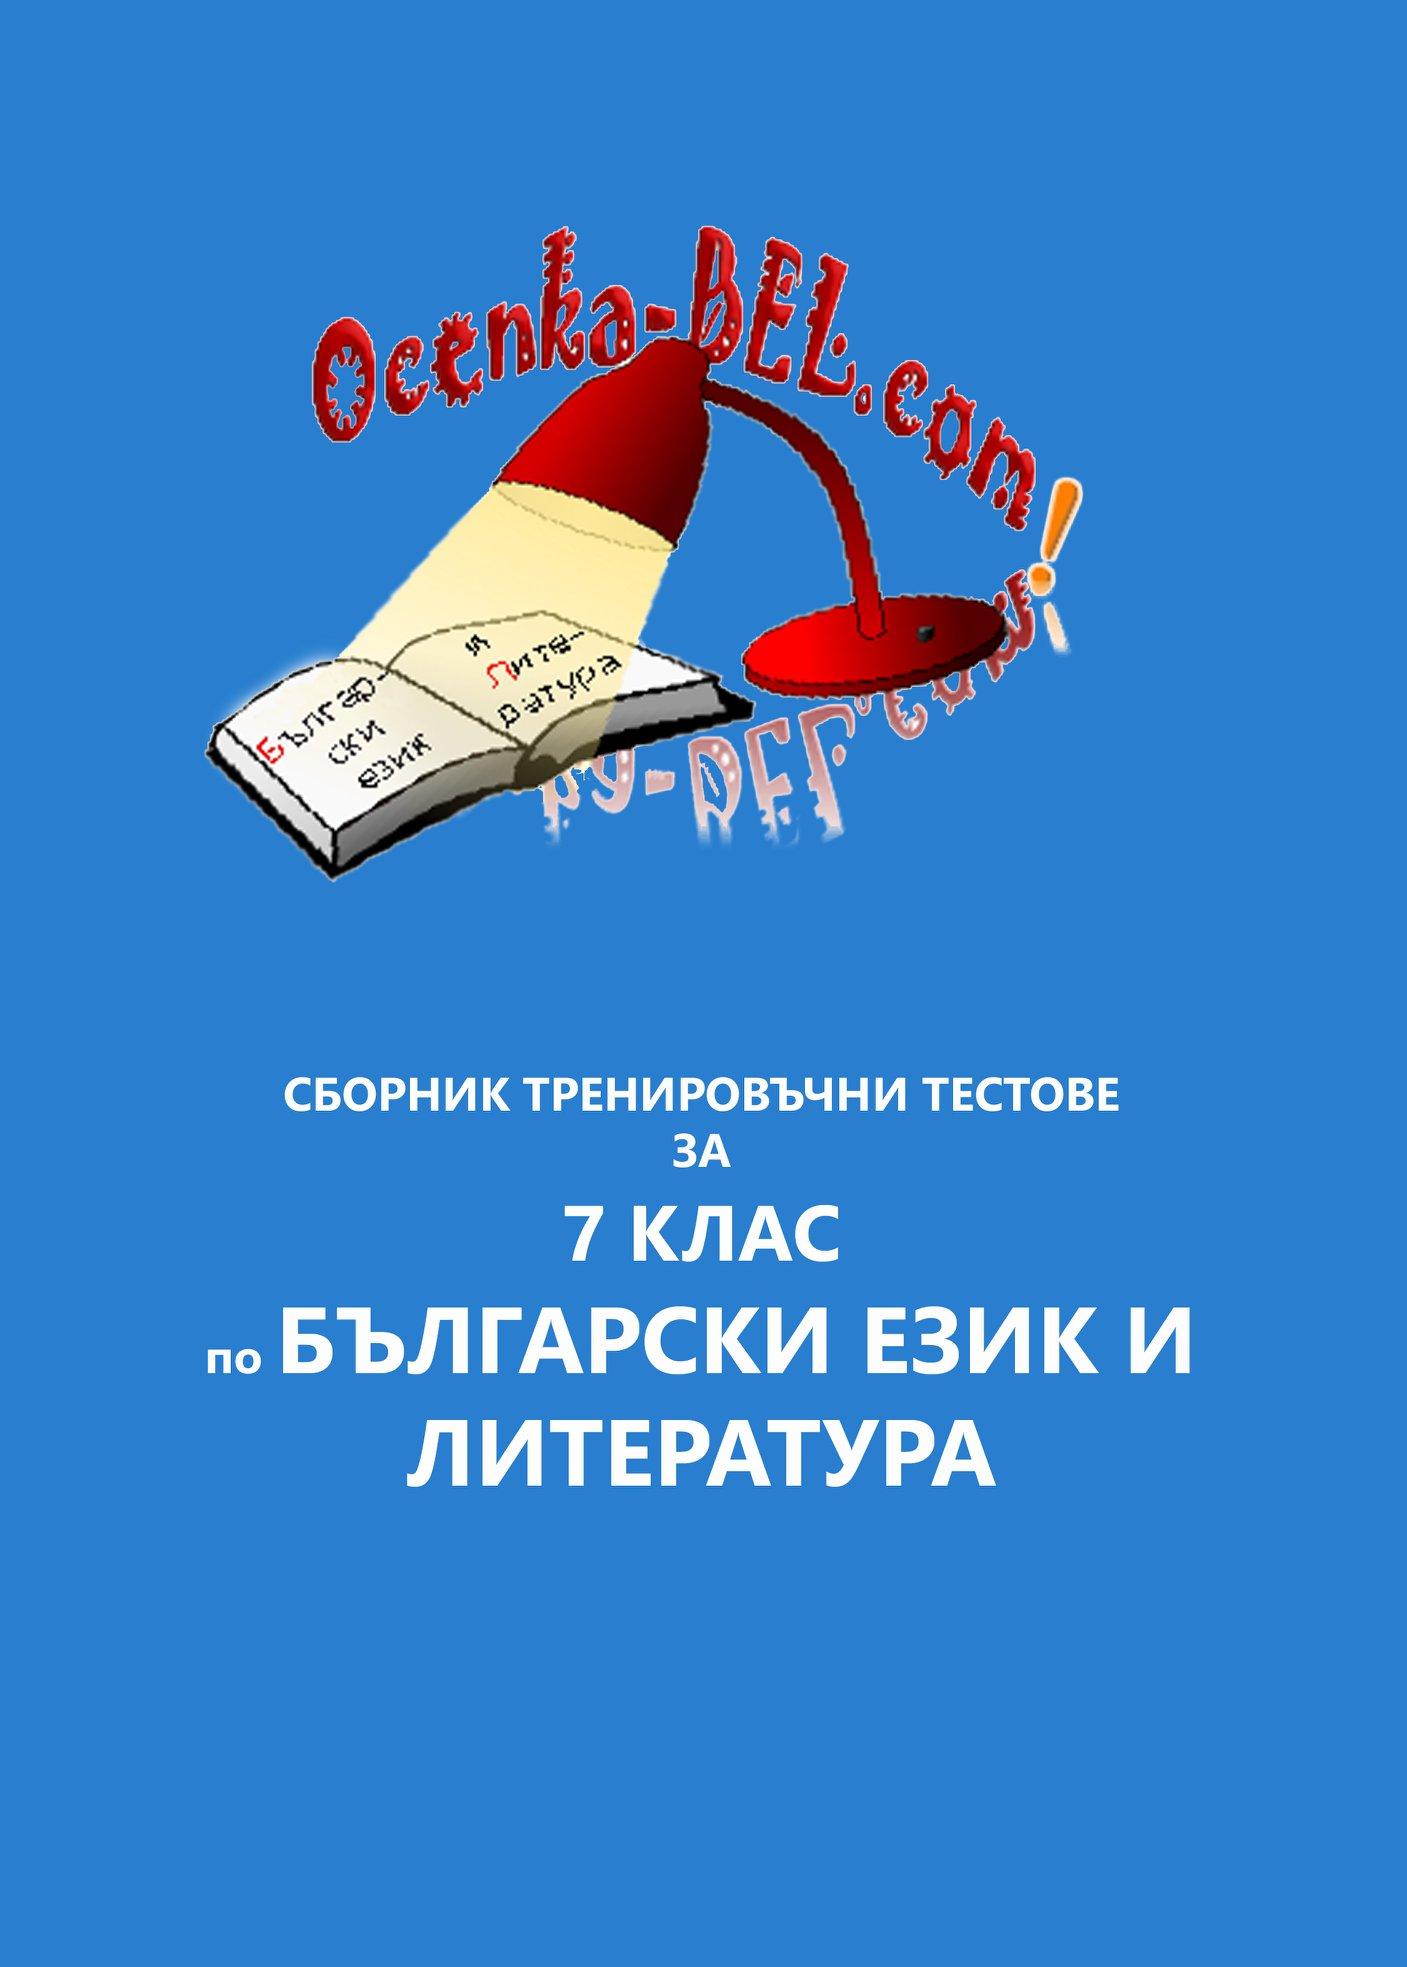 Сборник 7 клас